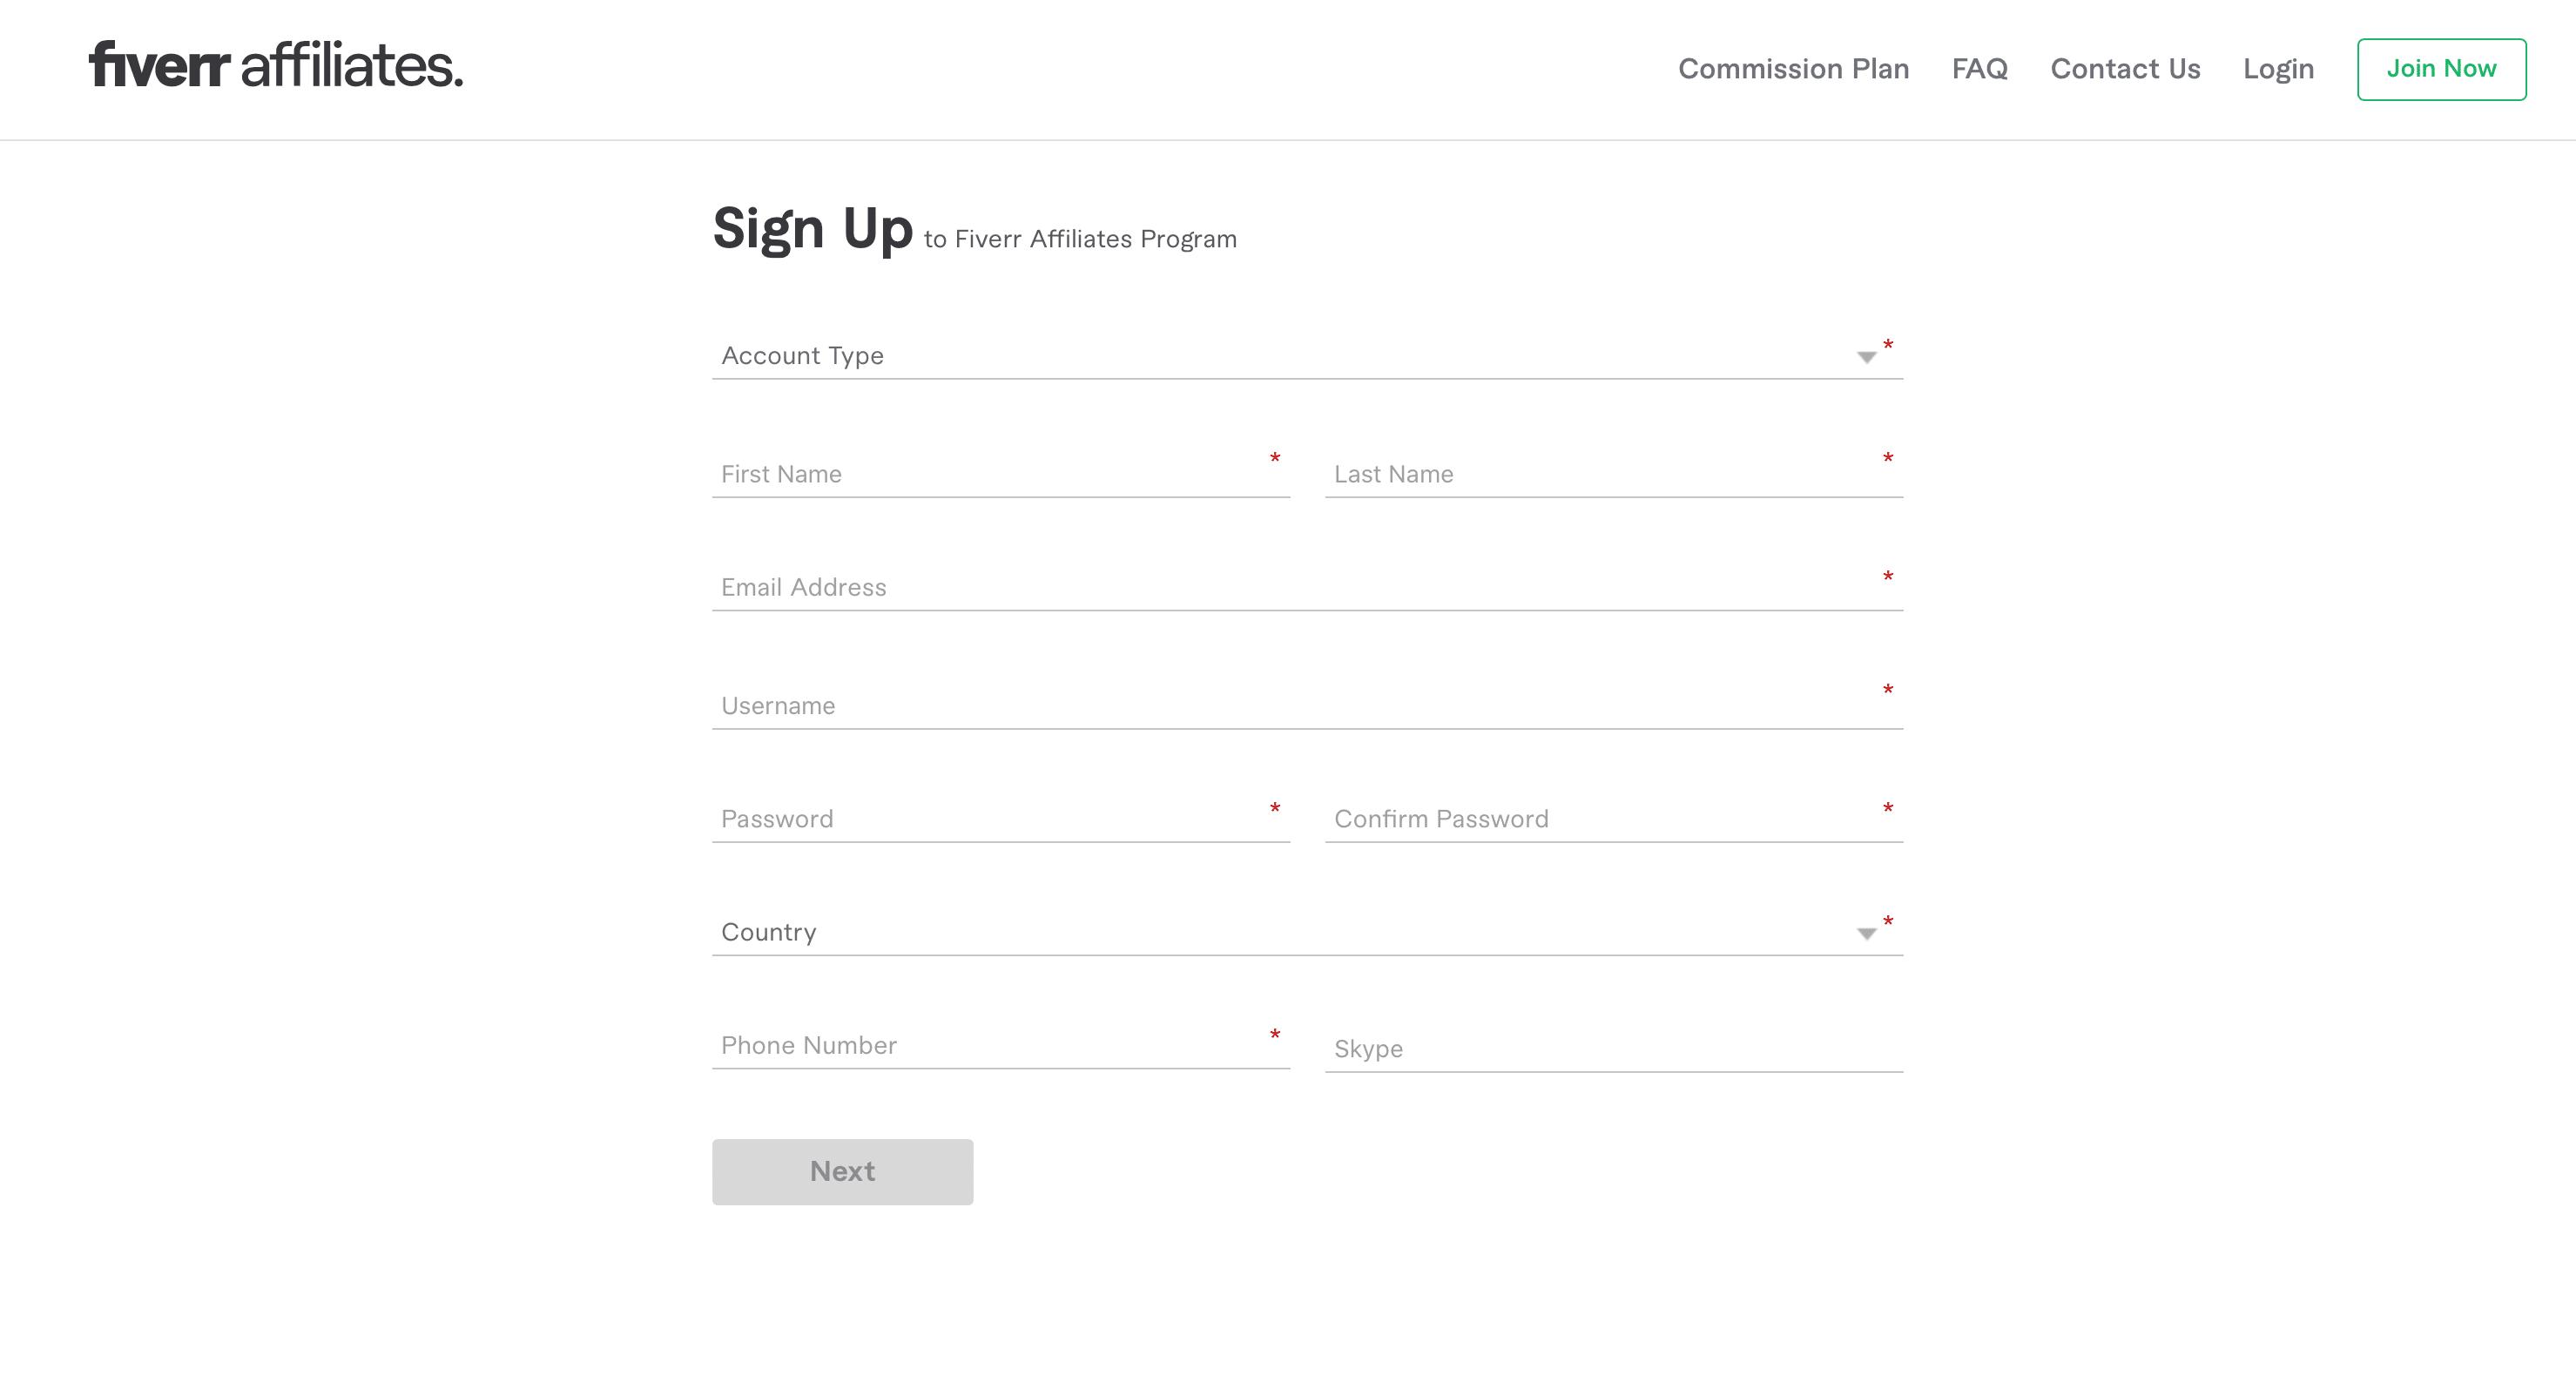 Fiverr-affiliates-signup-page